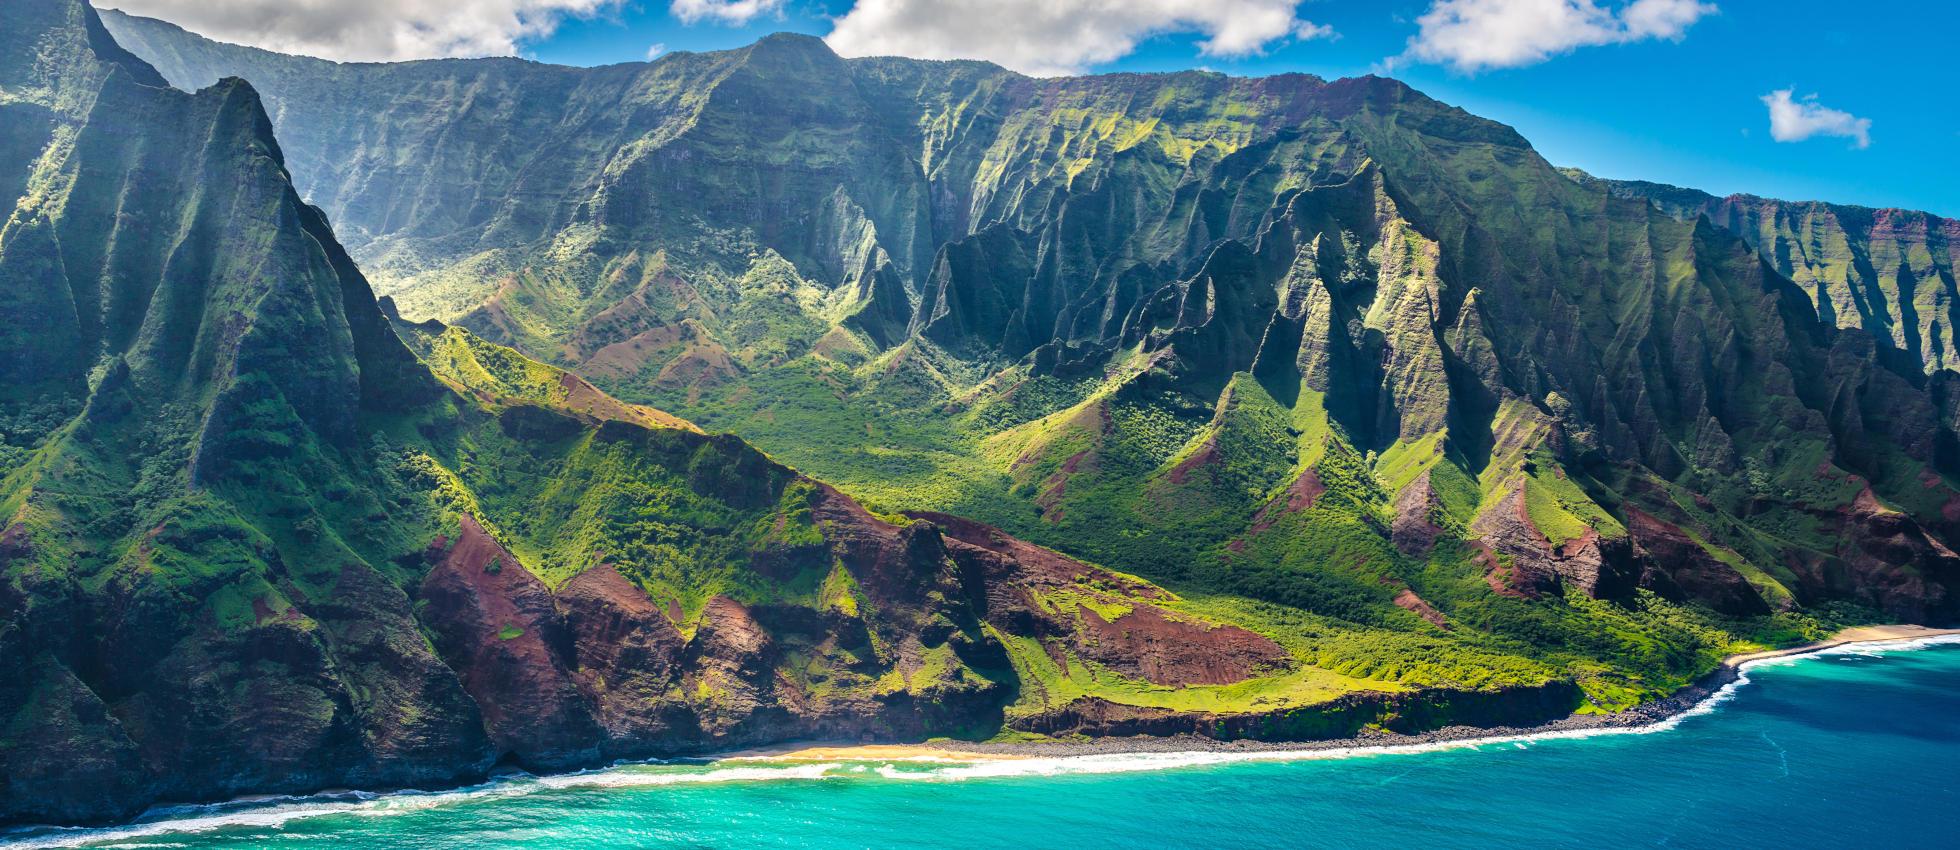 ARCC Gap | Hawaii: O'ahu, Kauai & the Big Island